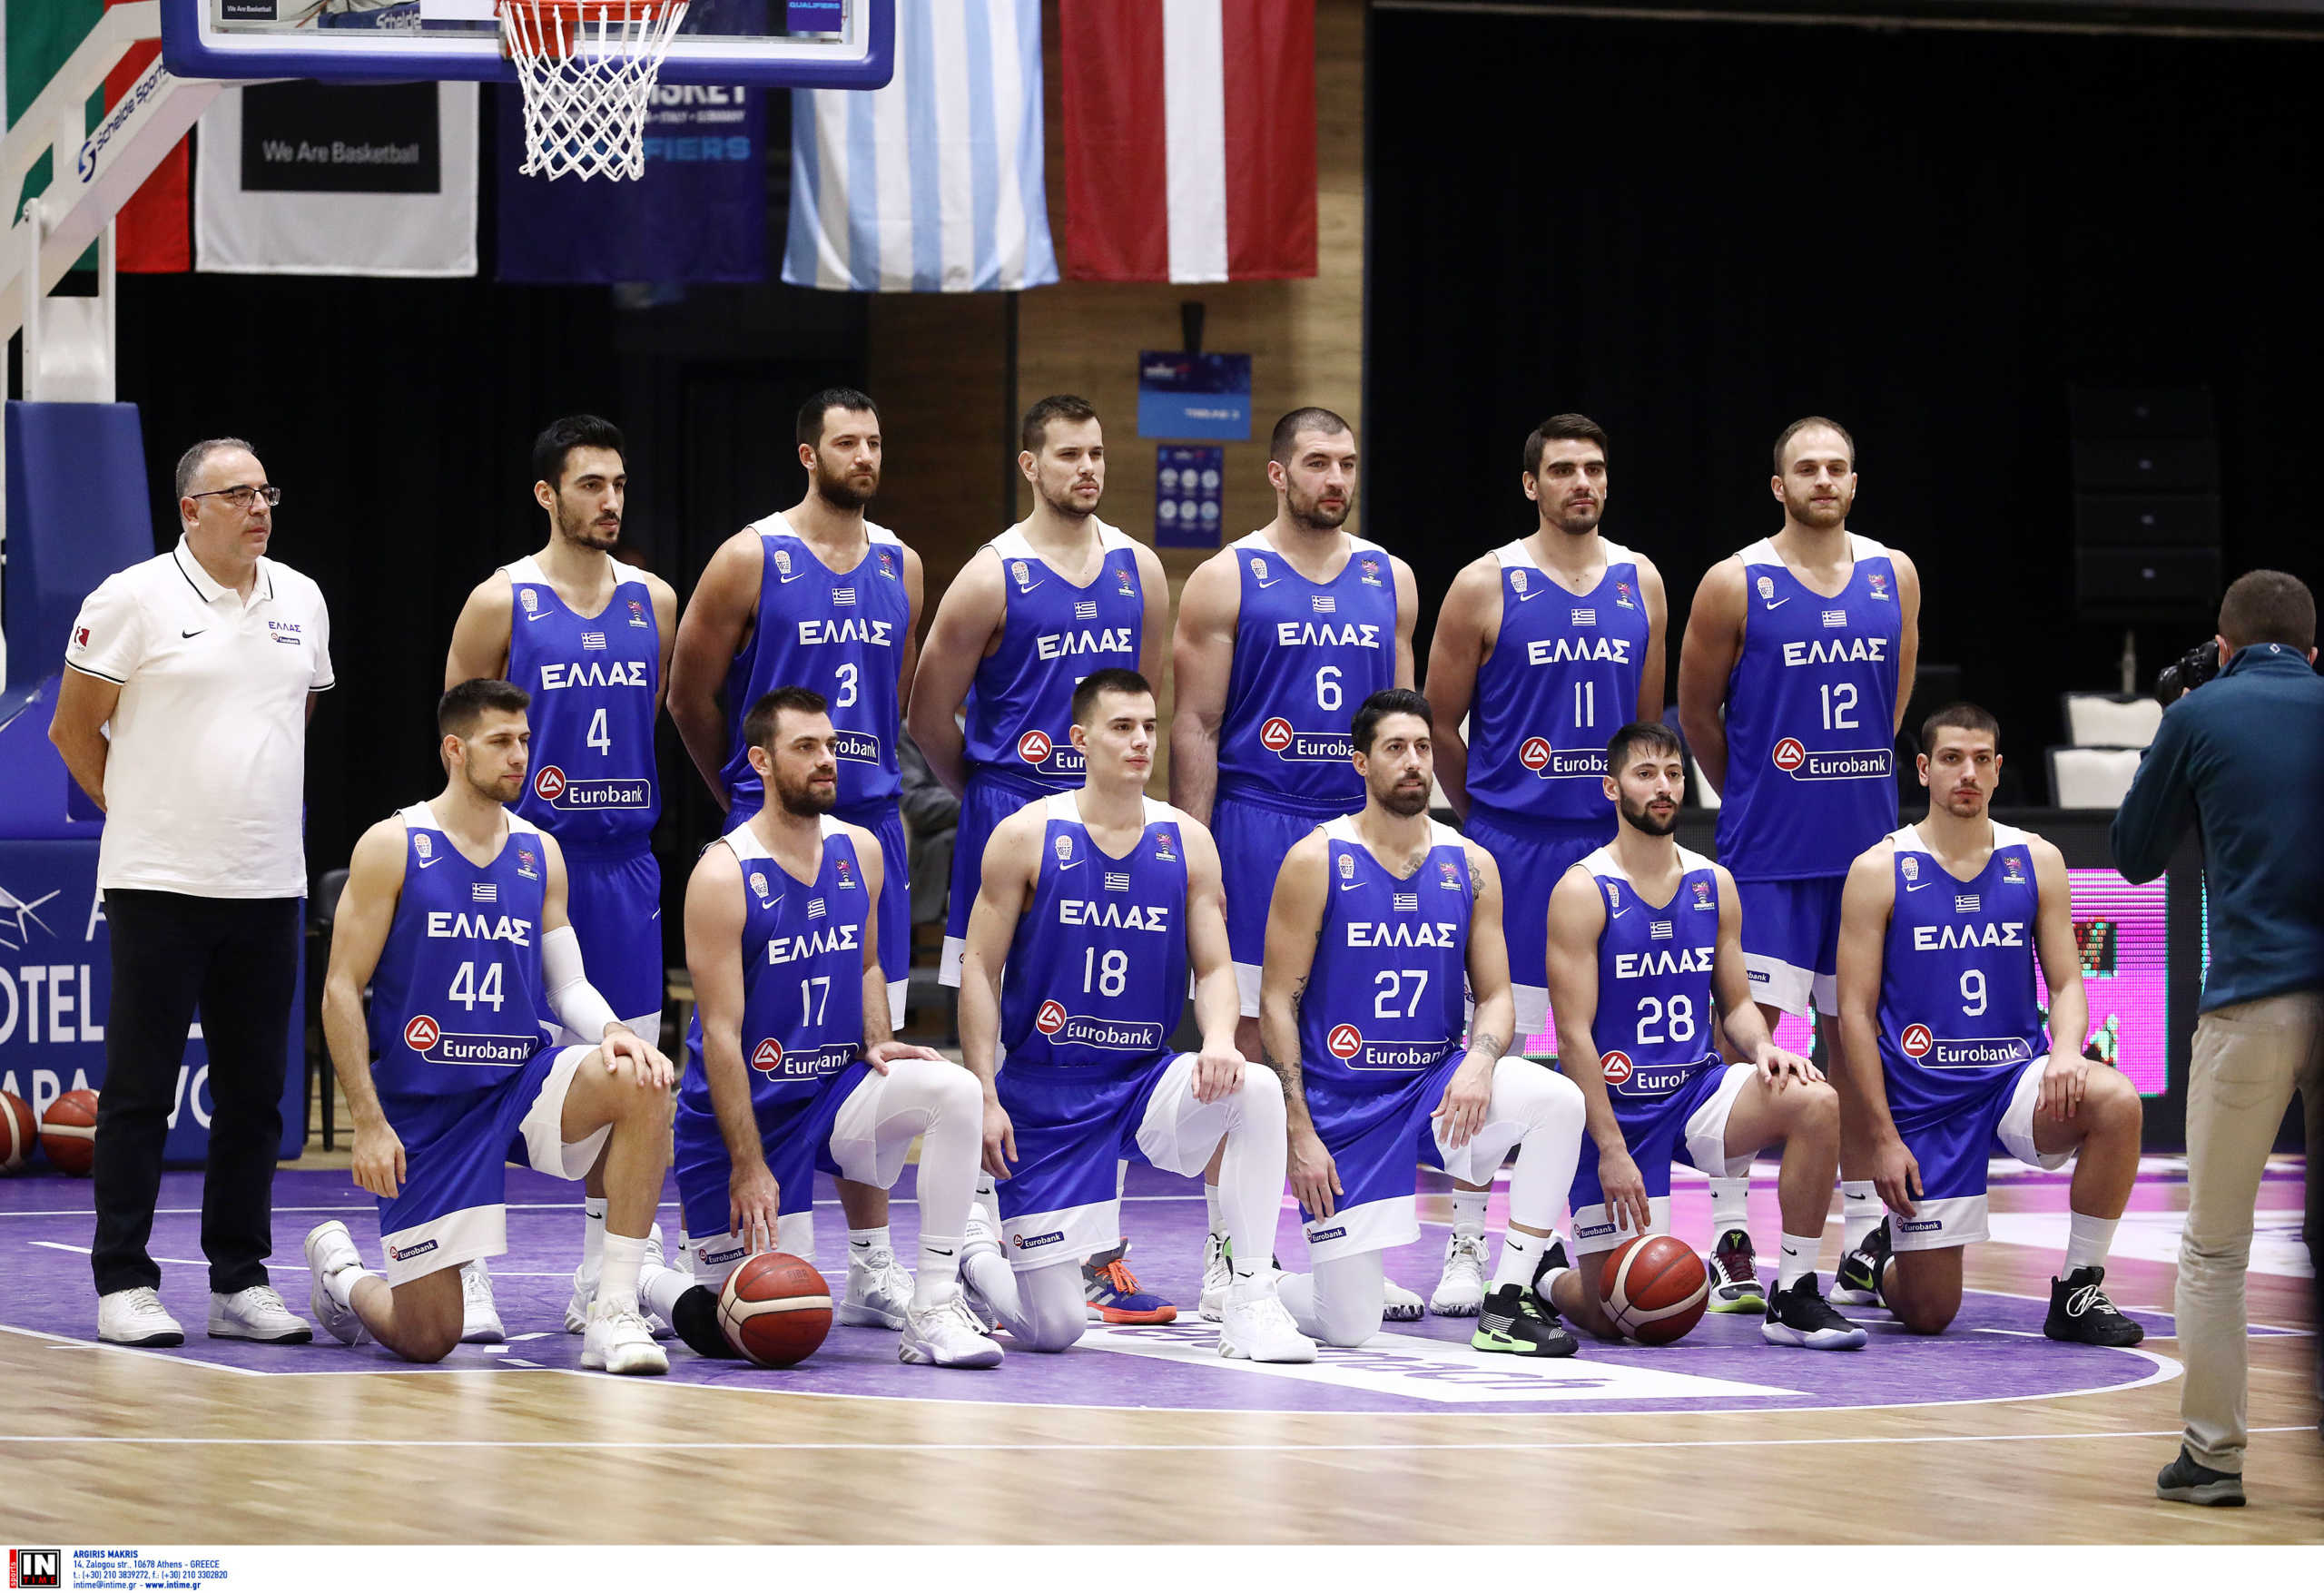 Eurobasket 2022: Στο πρώτο γκρουπ δυναμικότητας η Ελλάδα (pic)